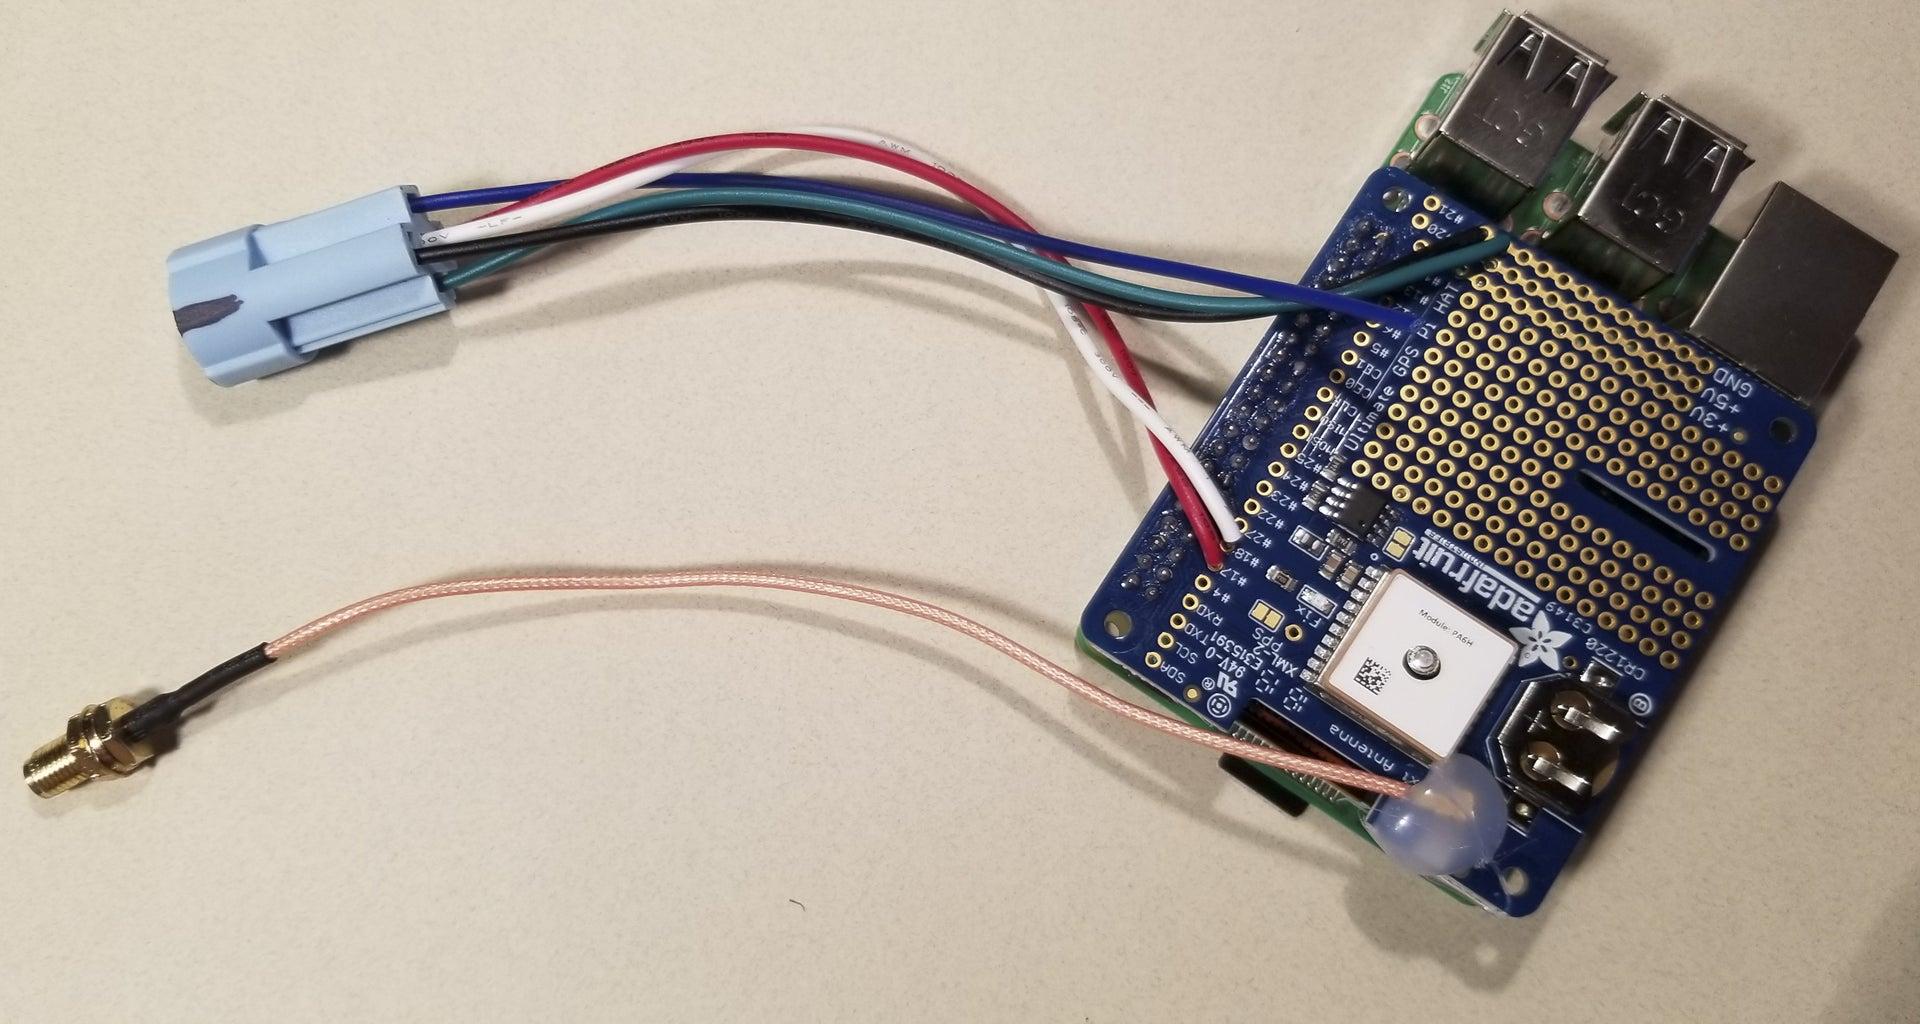 Assembling Raspberry Pi